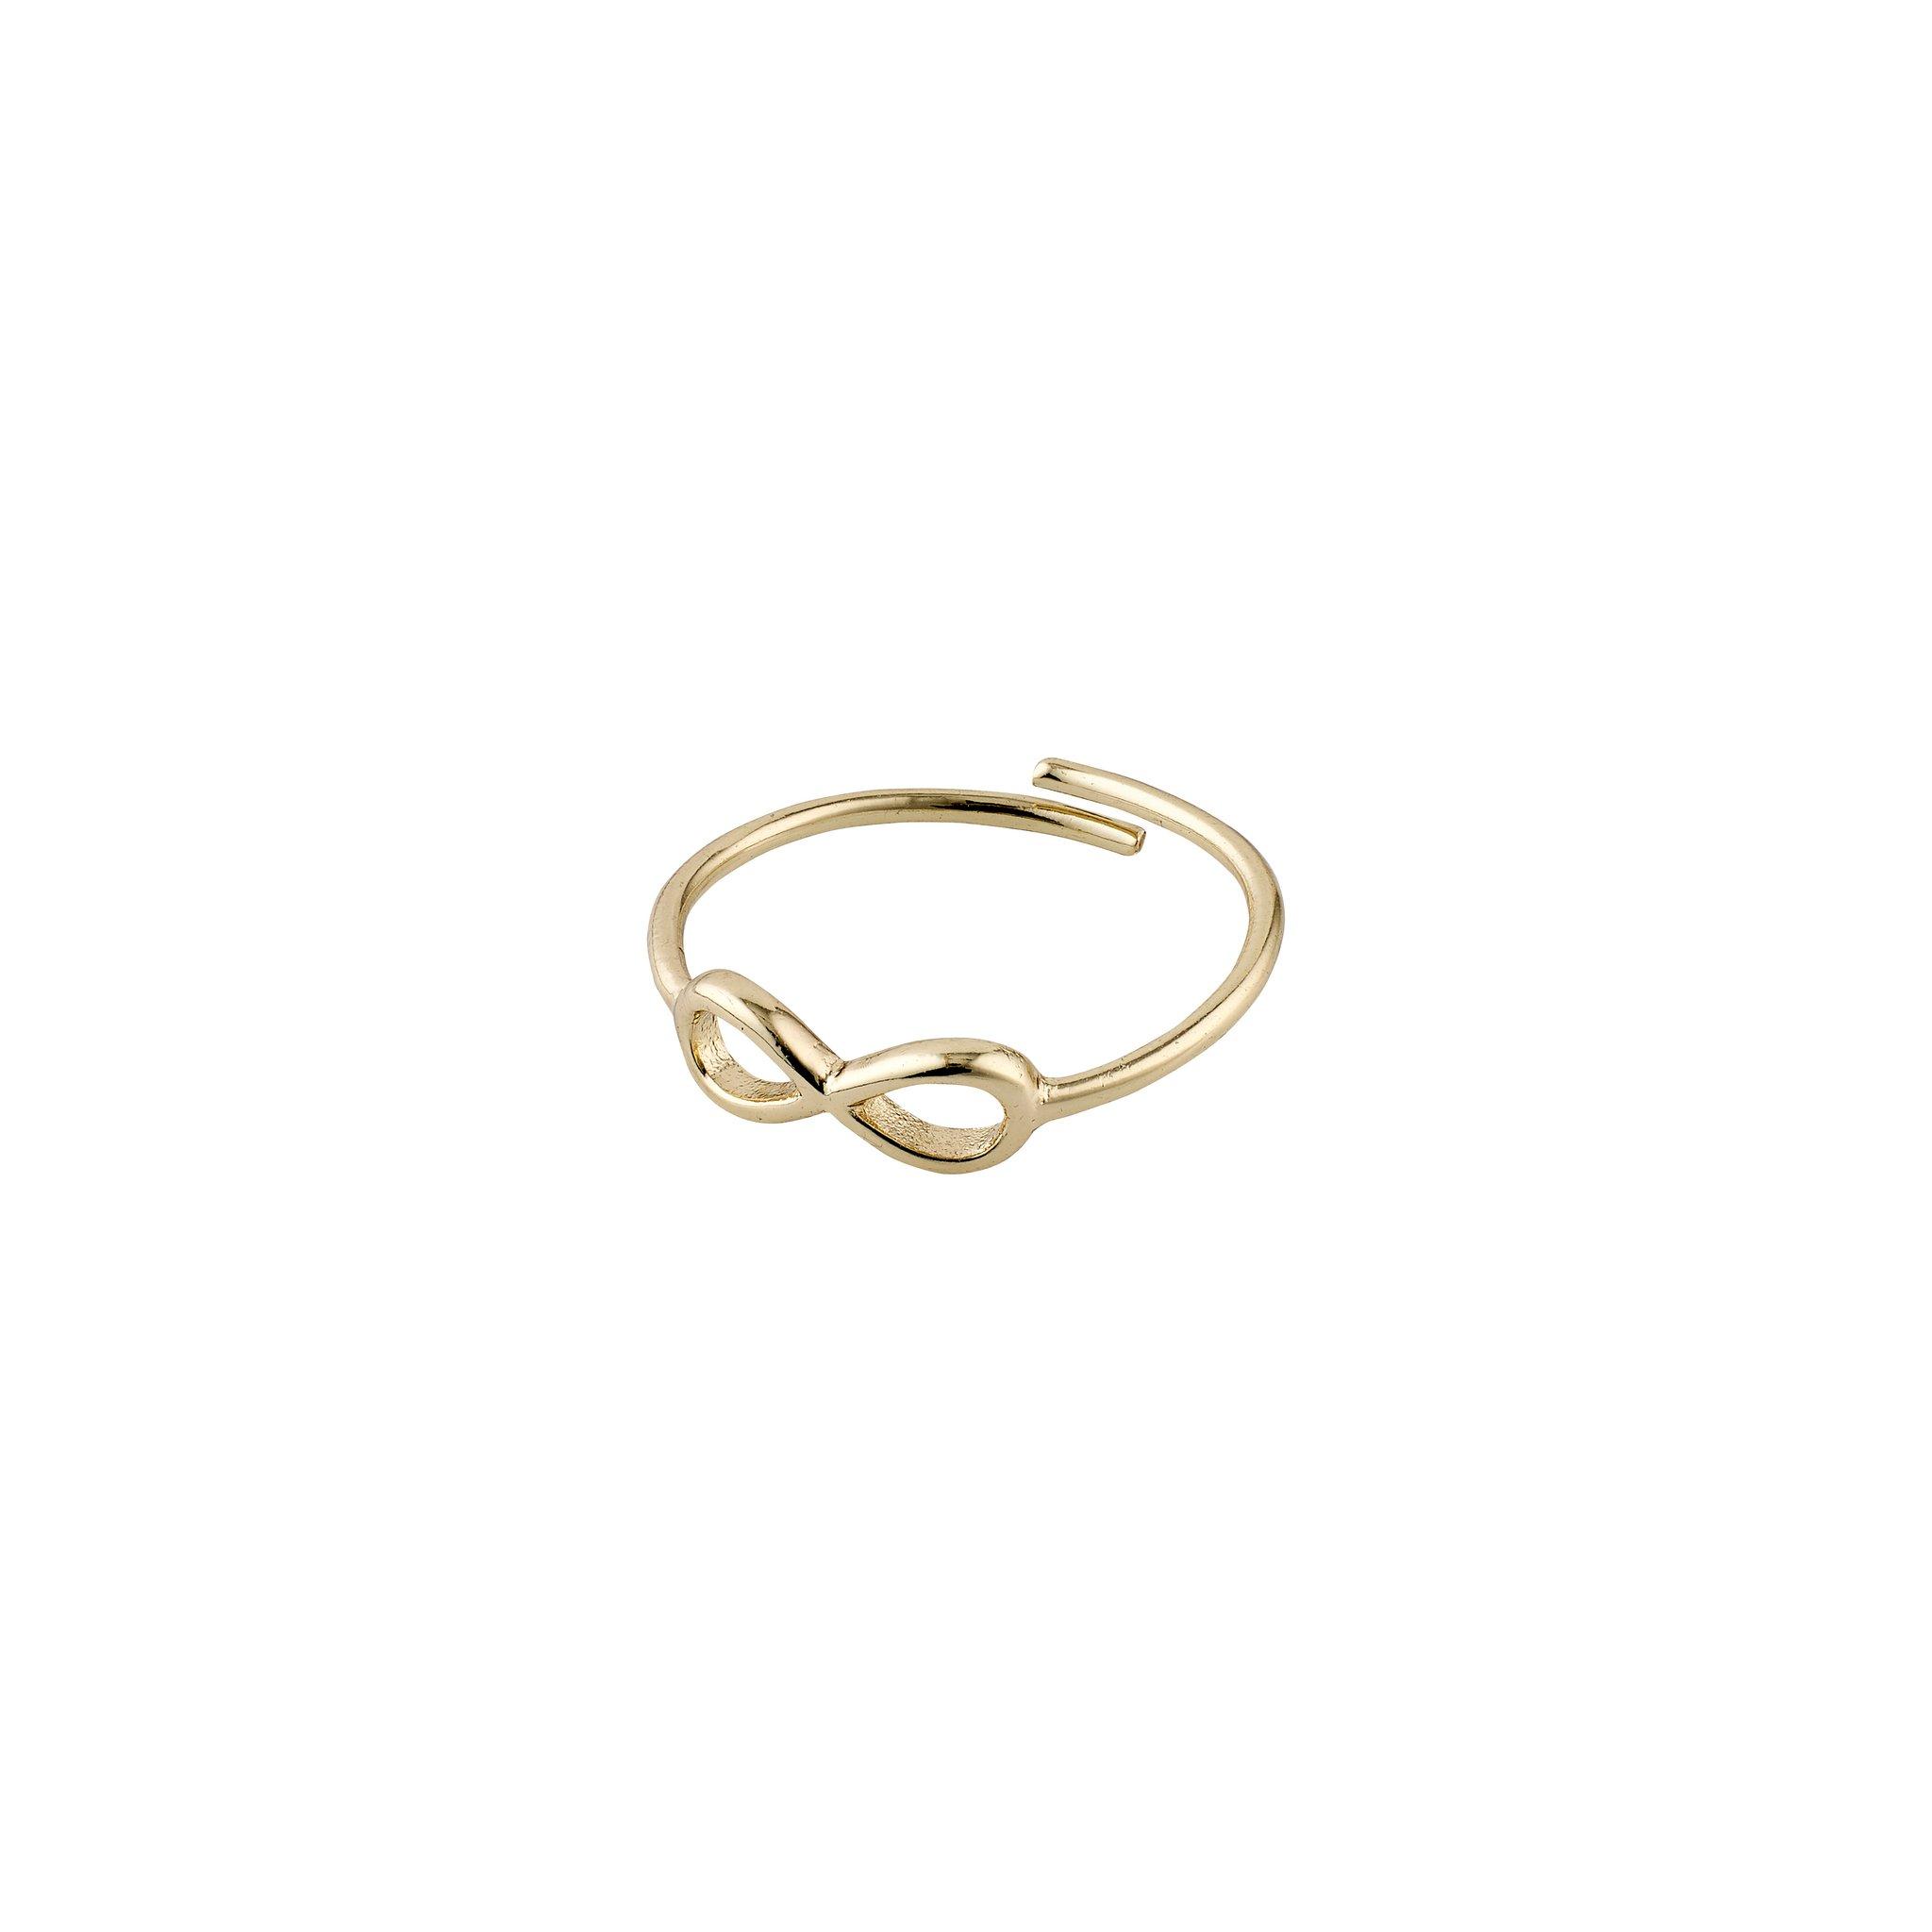 Pilgrim Lulu 2 ring